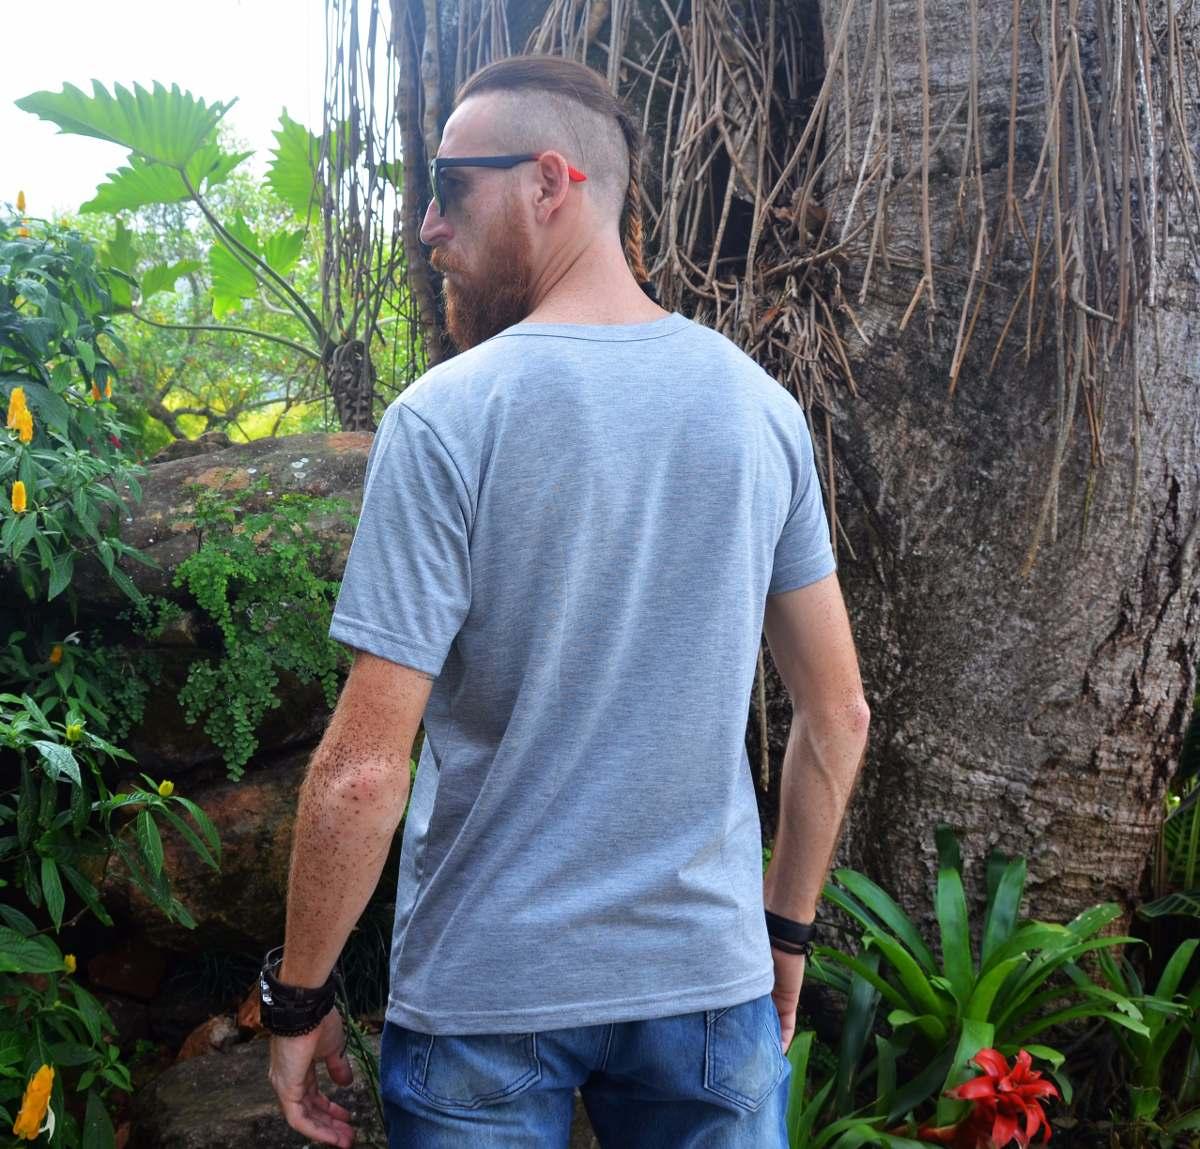 a702ea6551c2d camiseta básica mescla cinza masculina cool verão clássica. Carregando zoom.